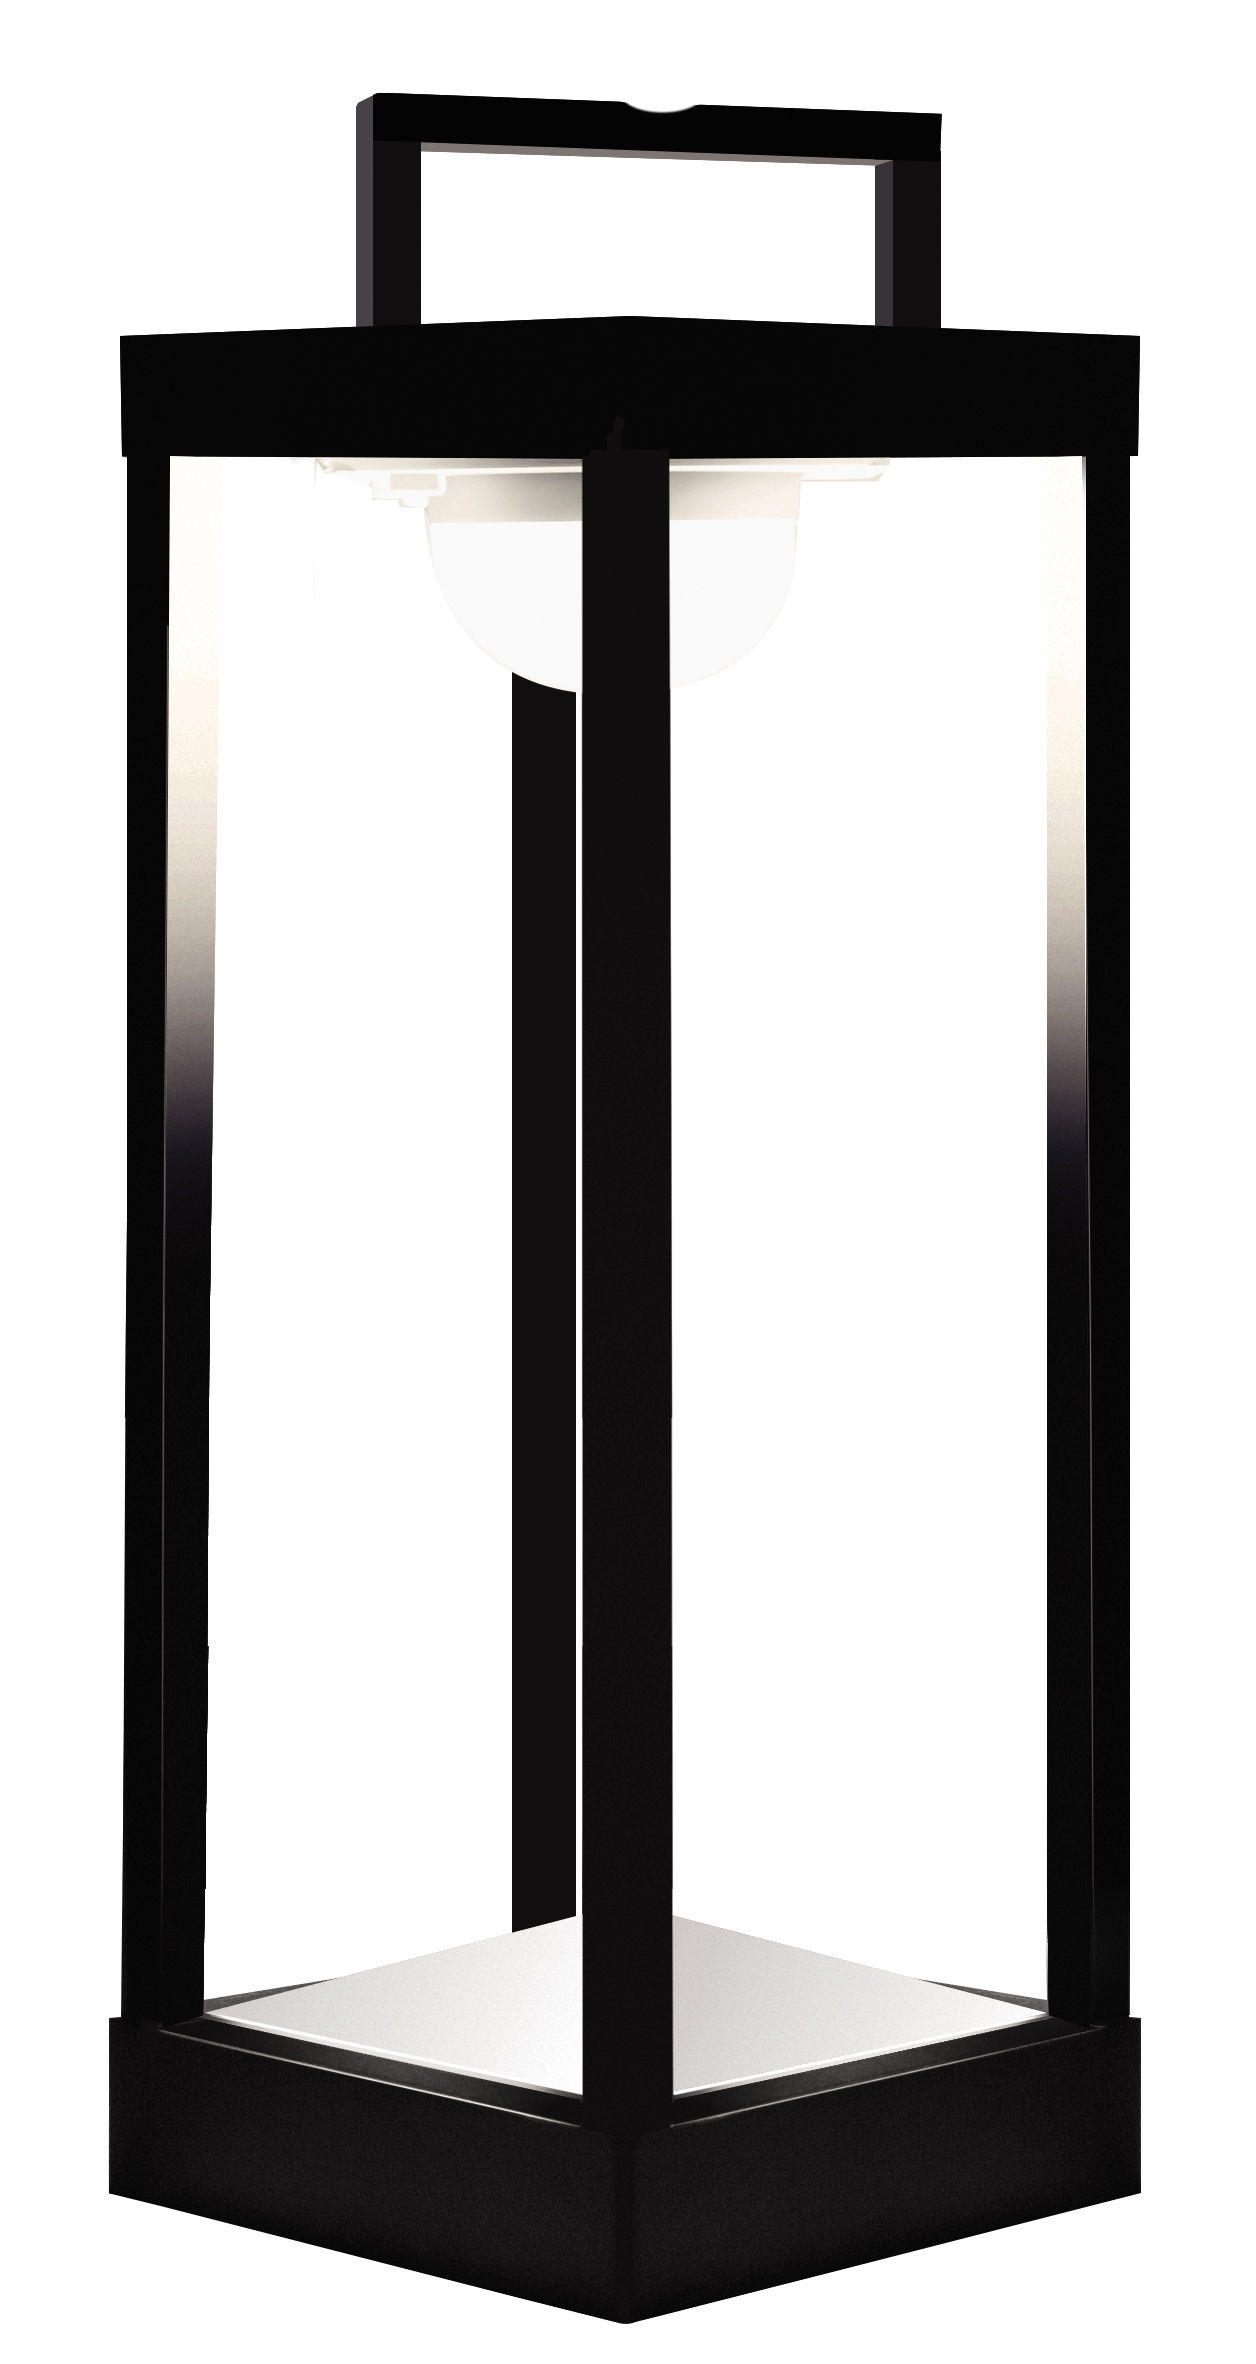 Lighting - Table Lamps - La Lampe Parc L Solar lamp - LED - Wireless - H 50 cm by Maiori - Black - Aluminium, Glass